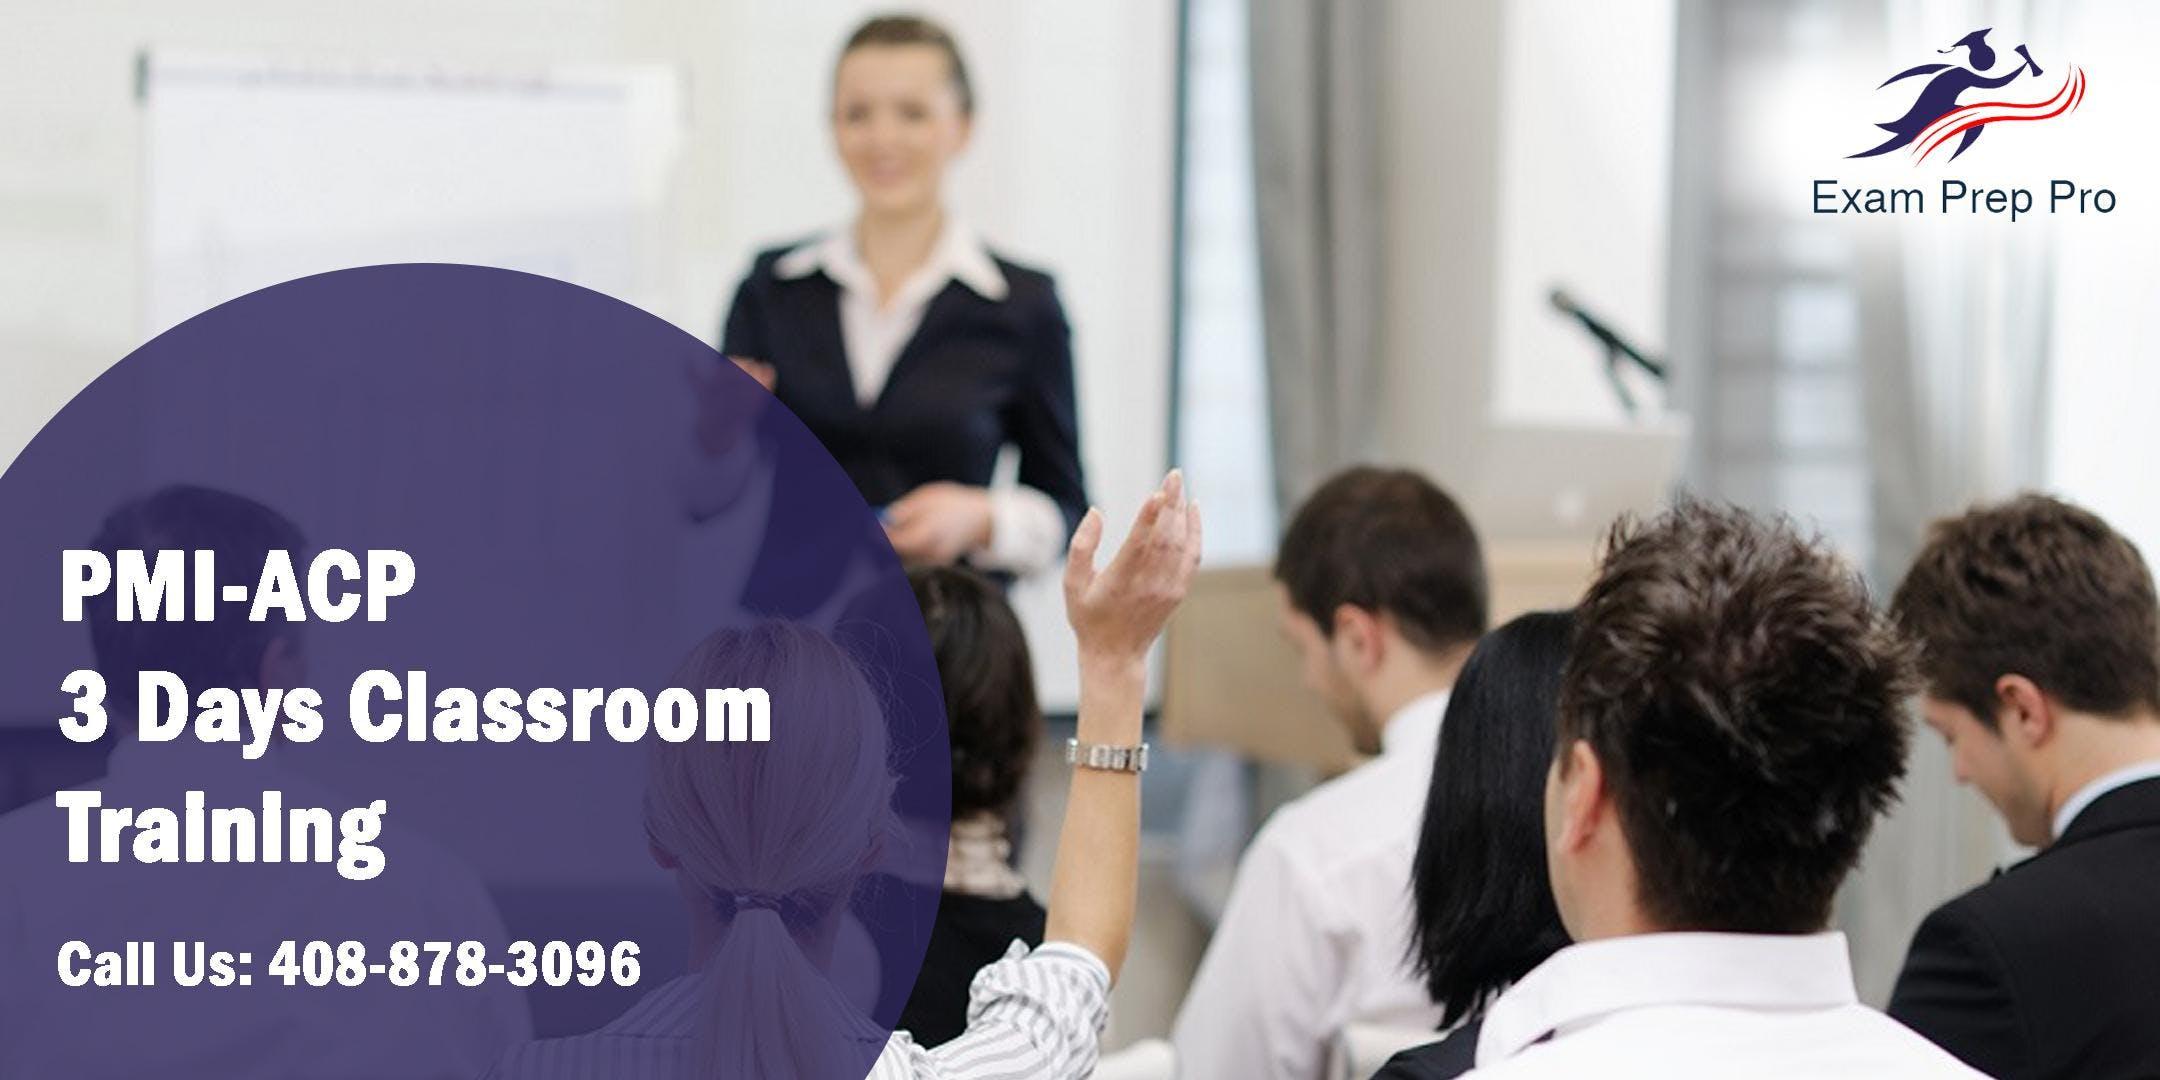 PMI-ACP 3 Days Classroom Training in Fargo,ND